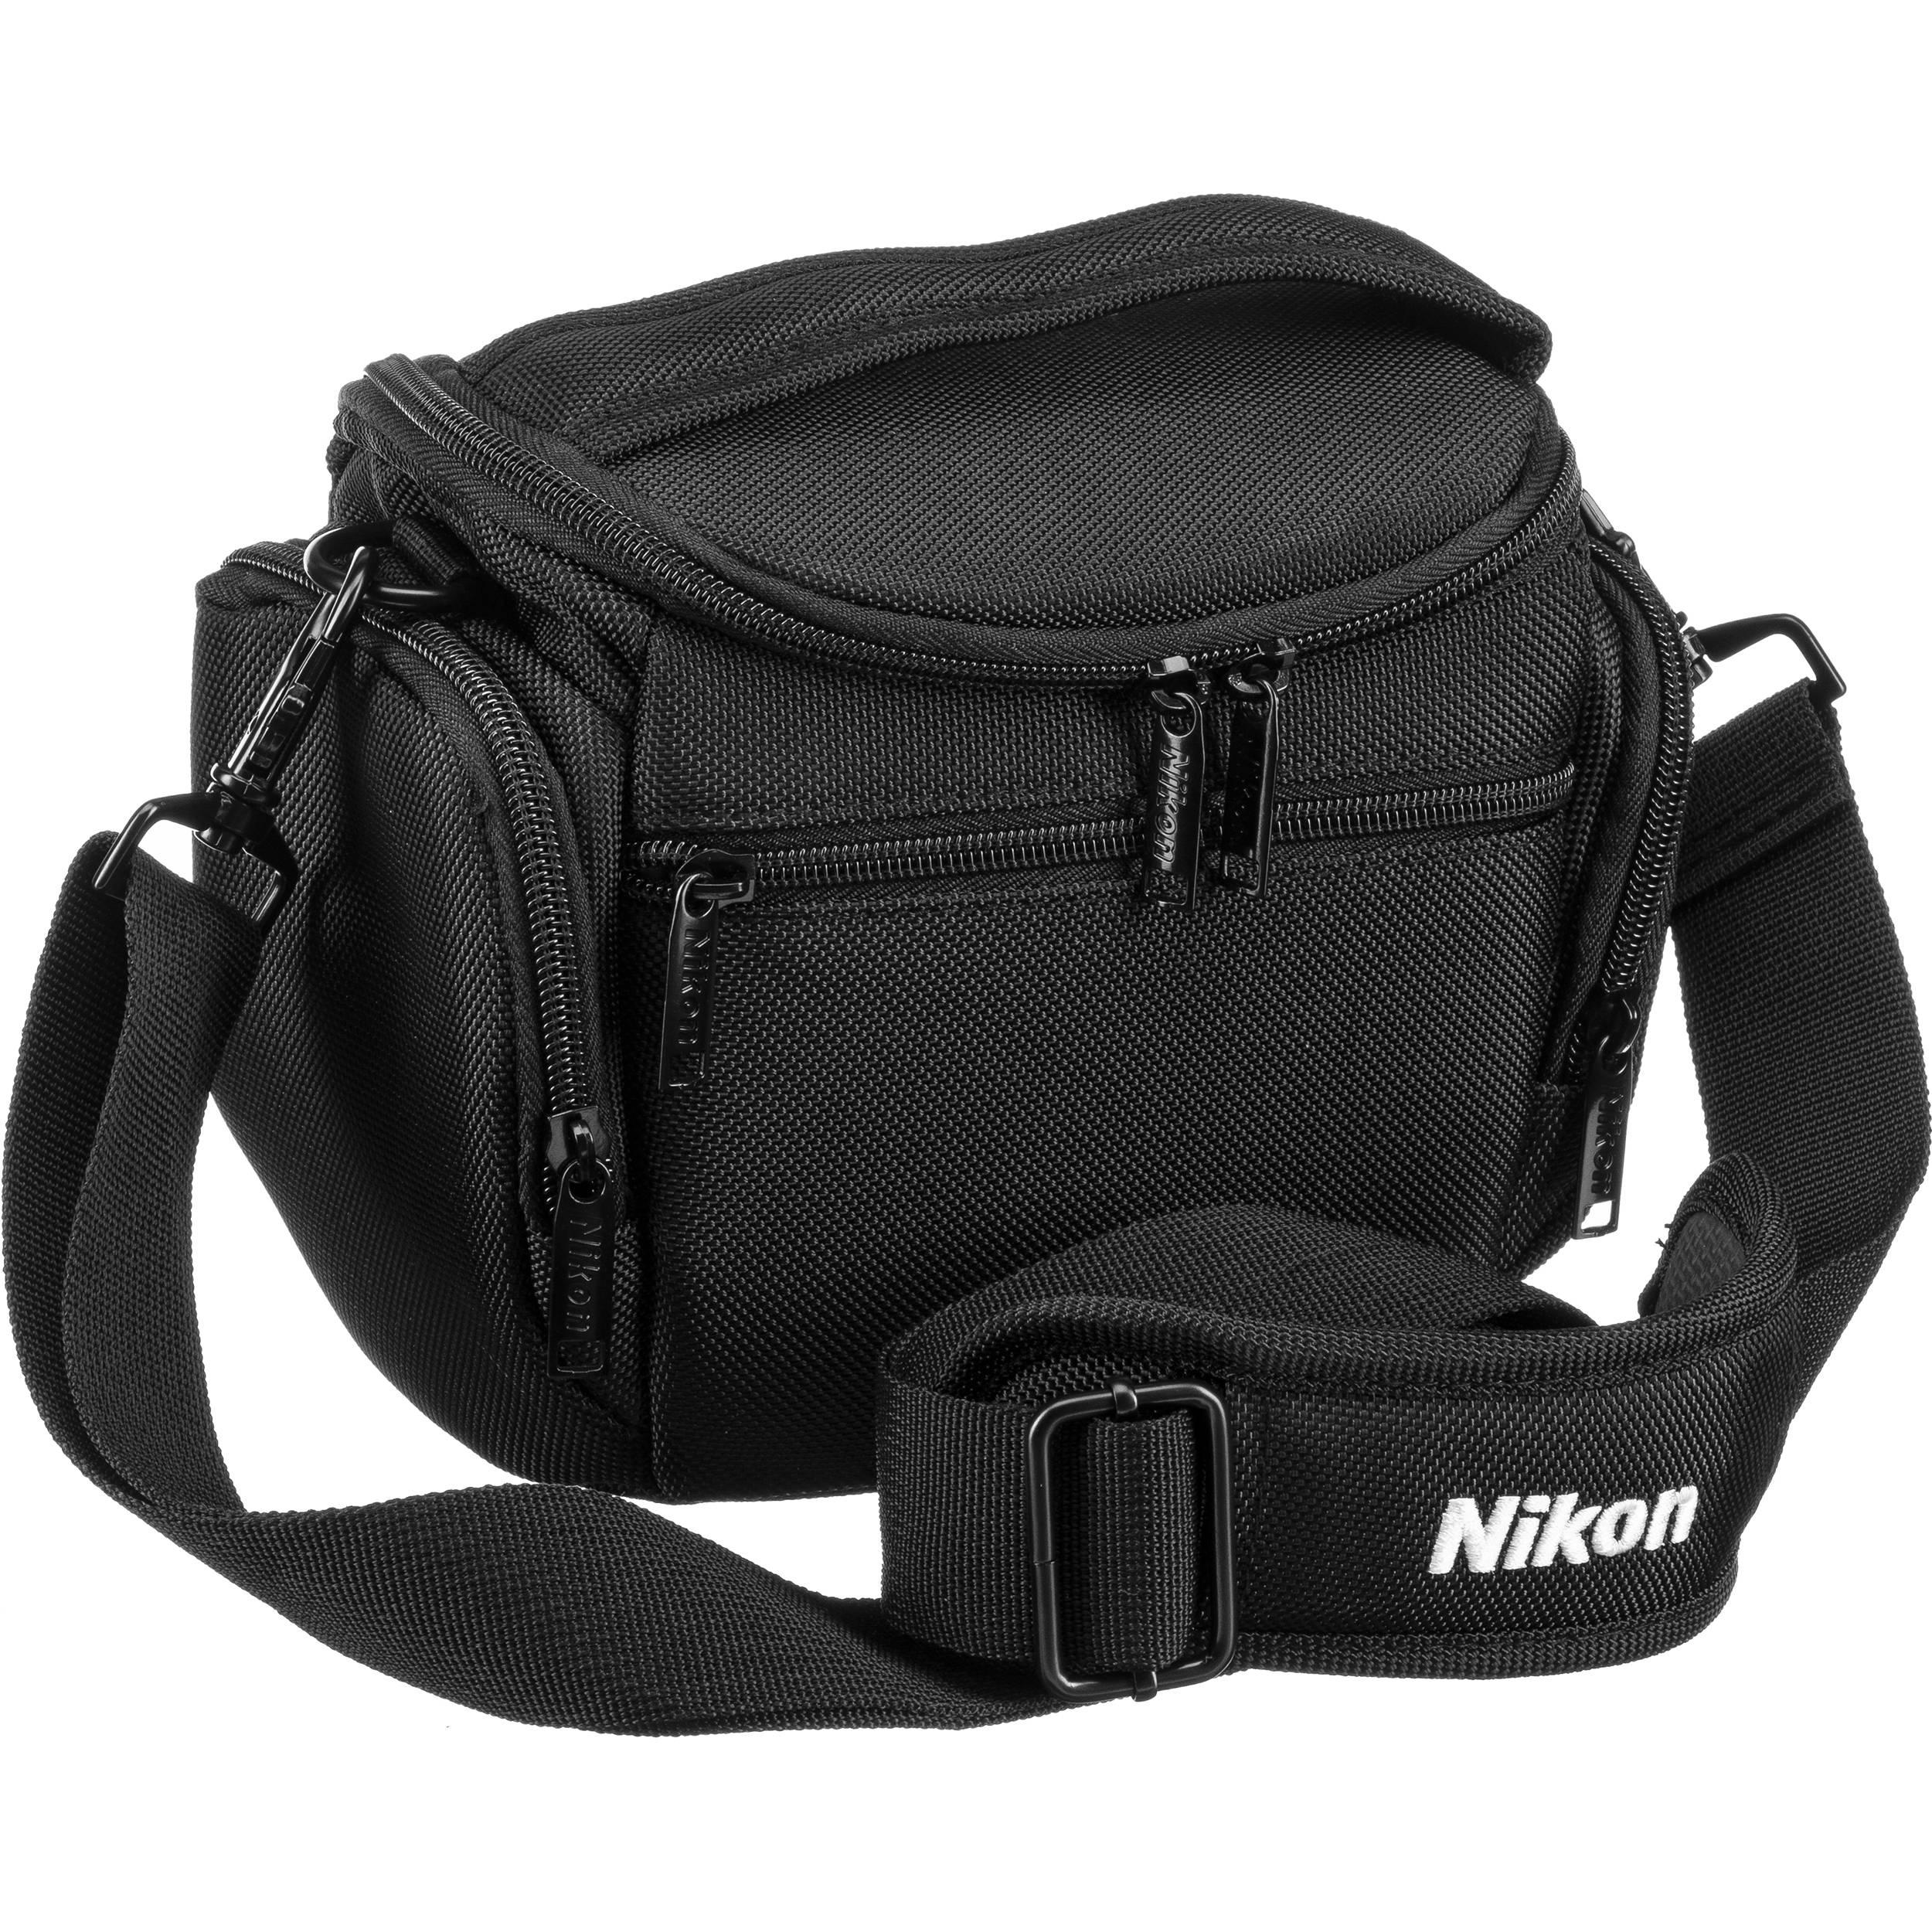 Nikon Compact Camera Bag For Coolpix Or Nikon 1 Camera 17009 B H